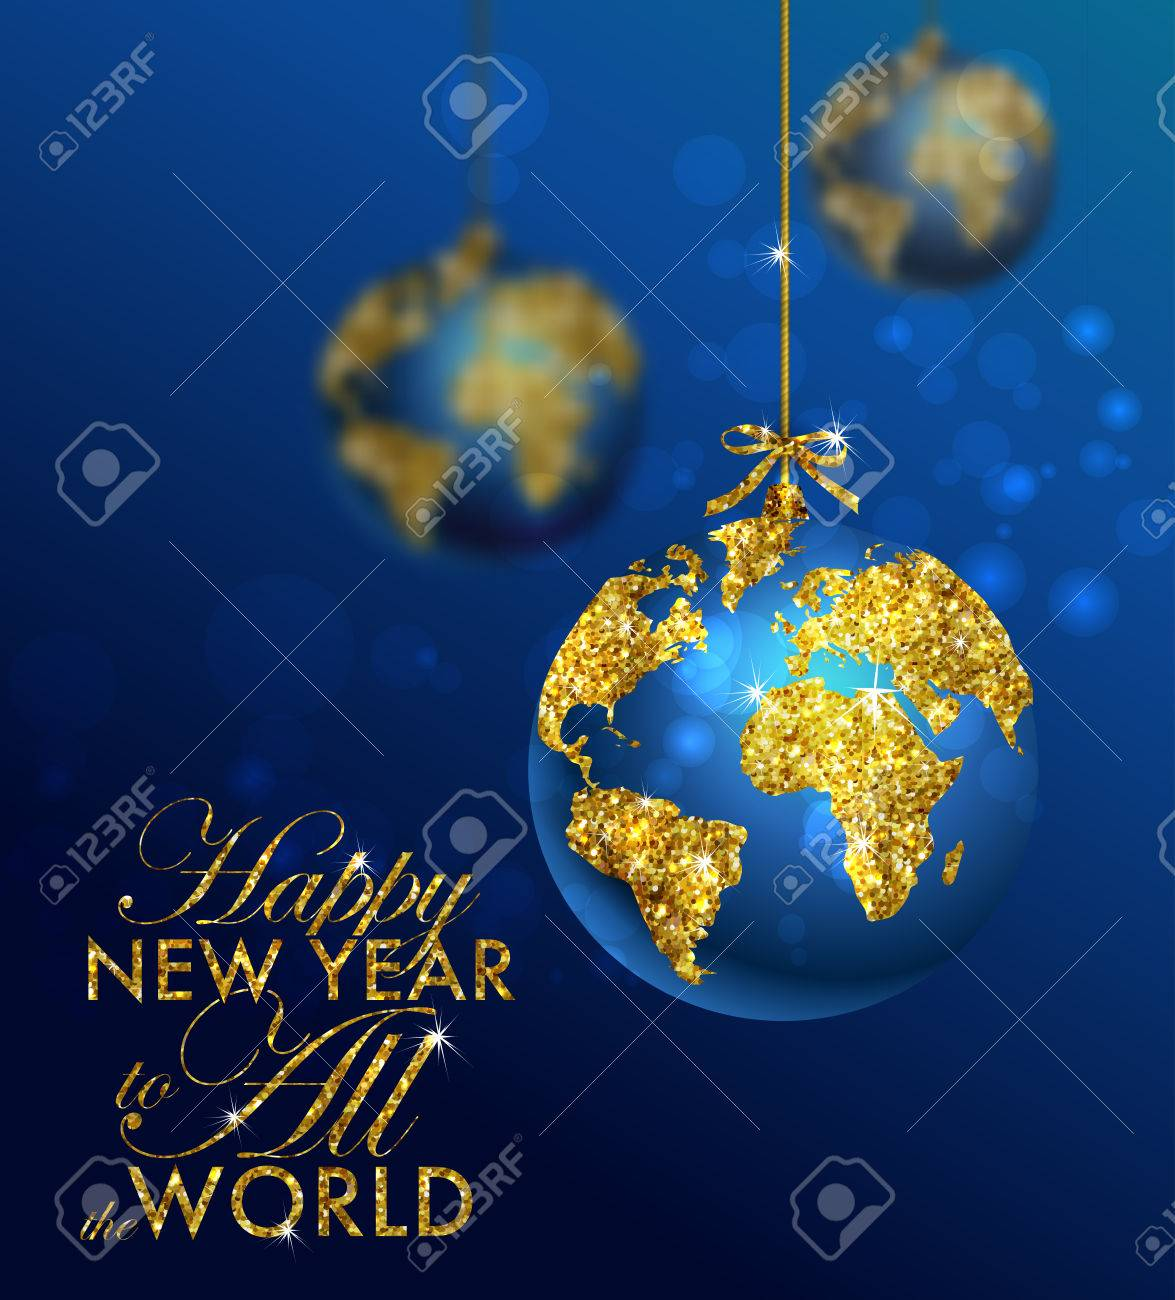 Glitter christmas ball with world map greeting card with typography glitter christmas ball with world map greeting card with typography and gold world globe gumiabroncs Choice Image